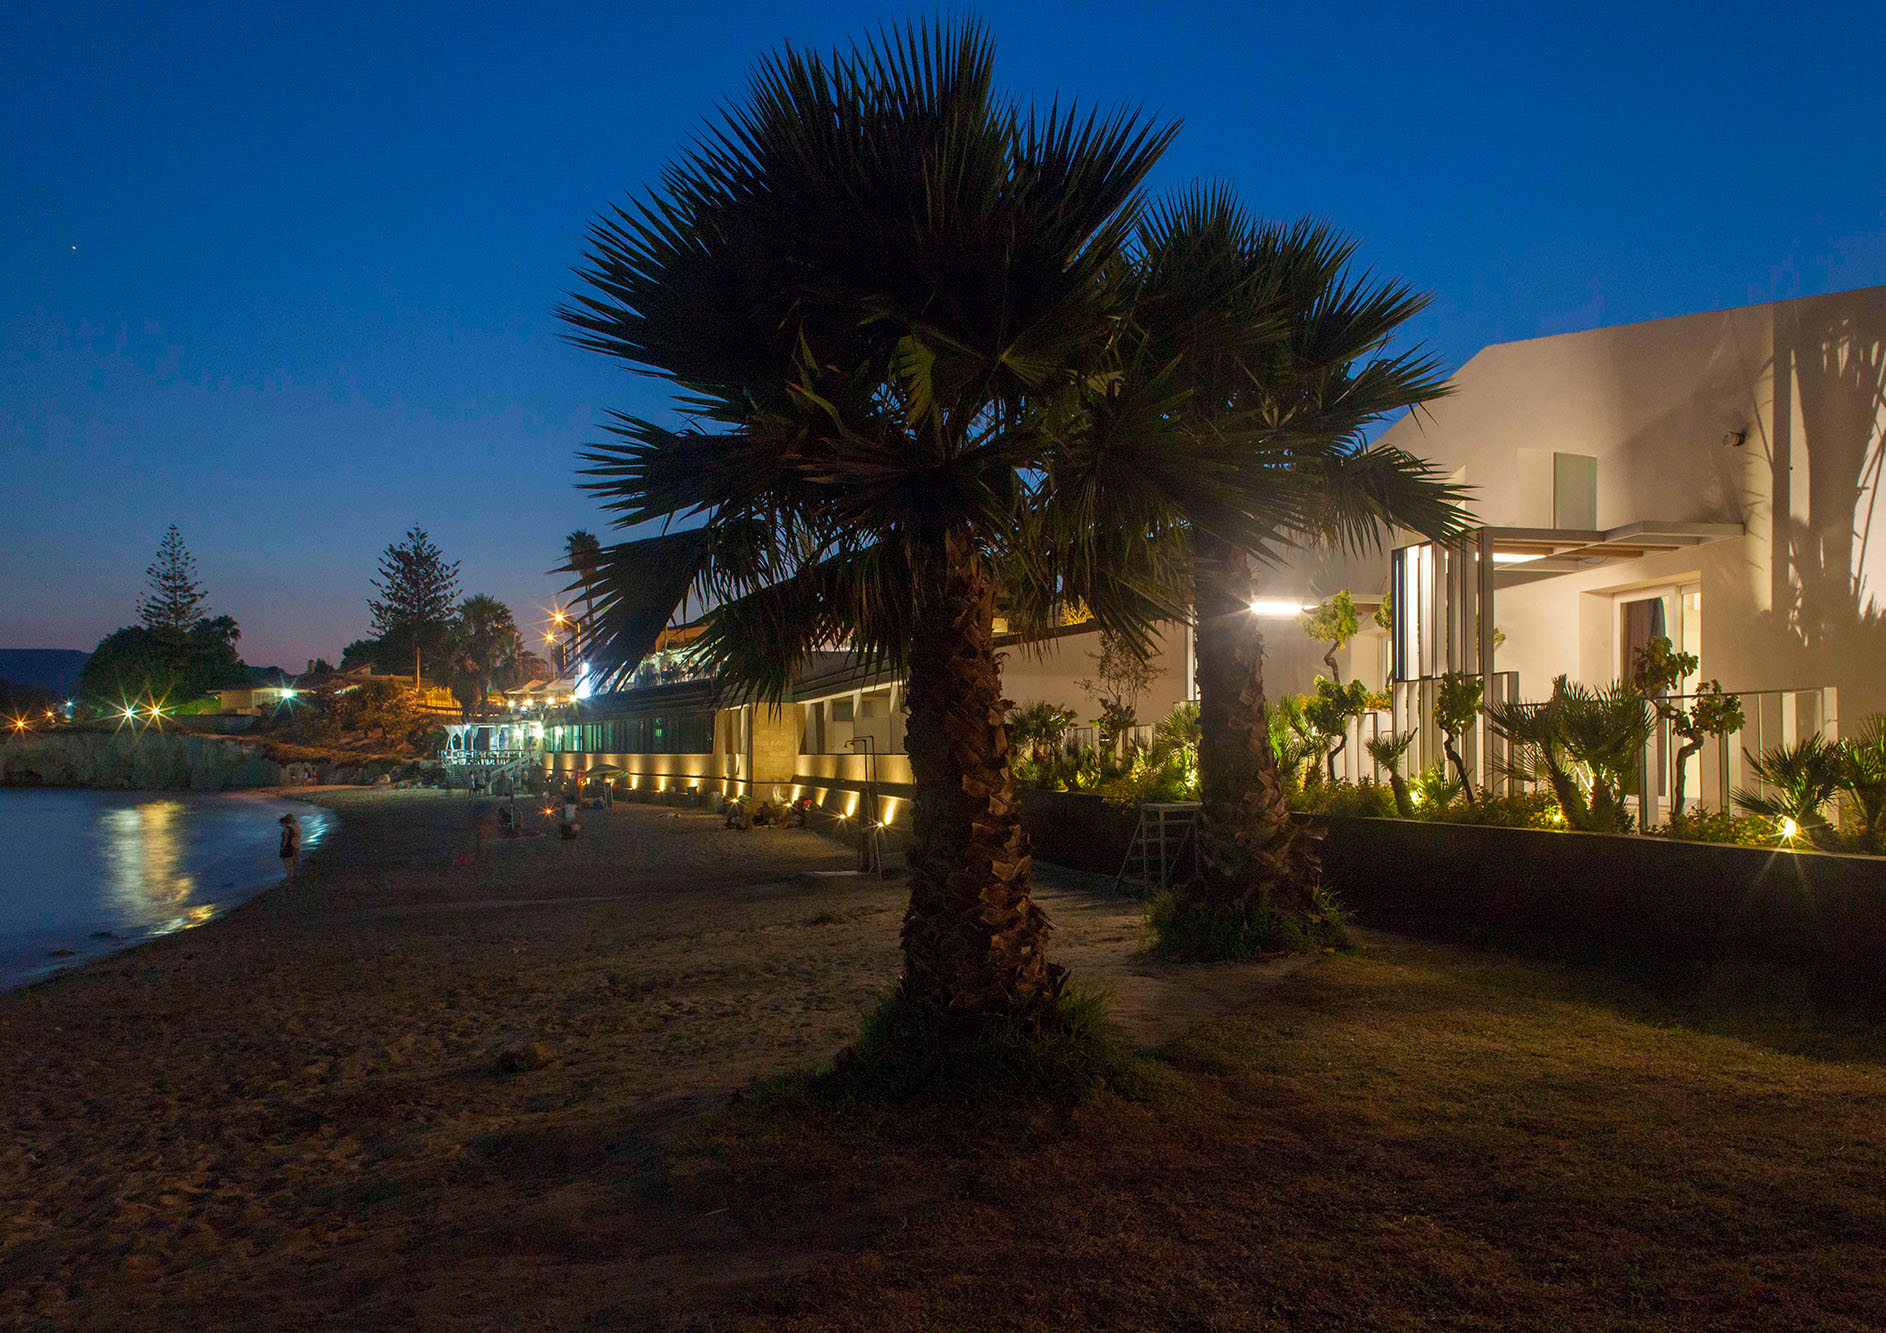 calapetra-resort-fontane-bianche-siracusa-1